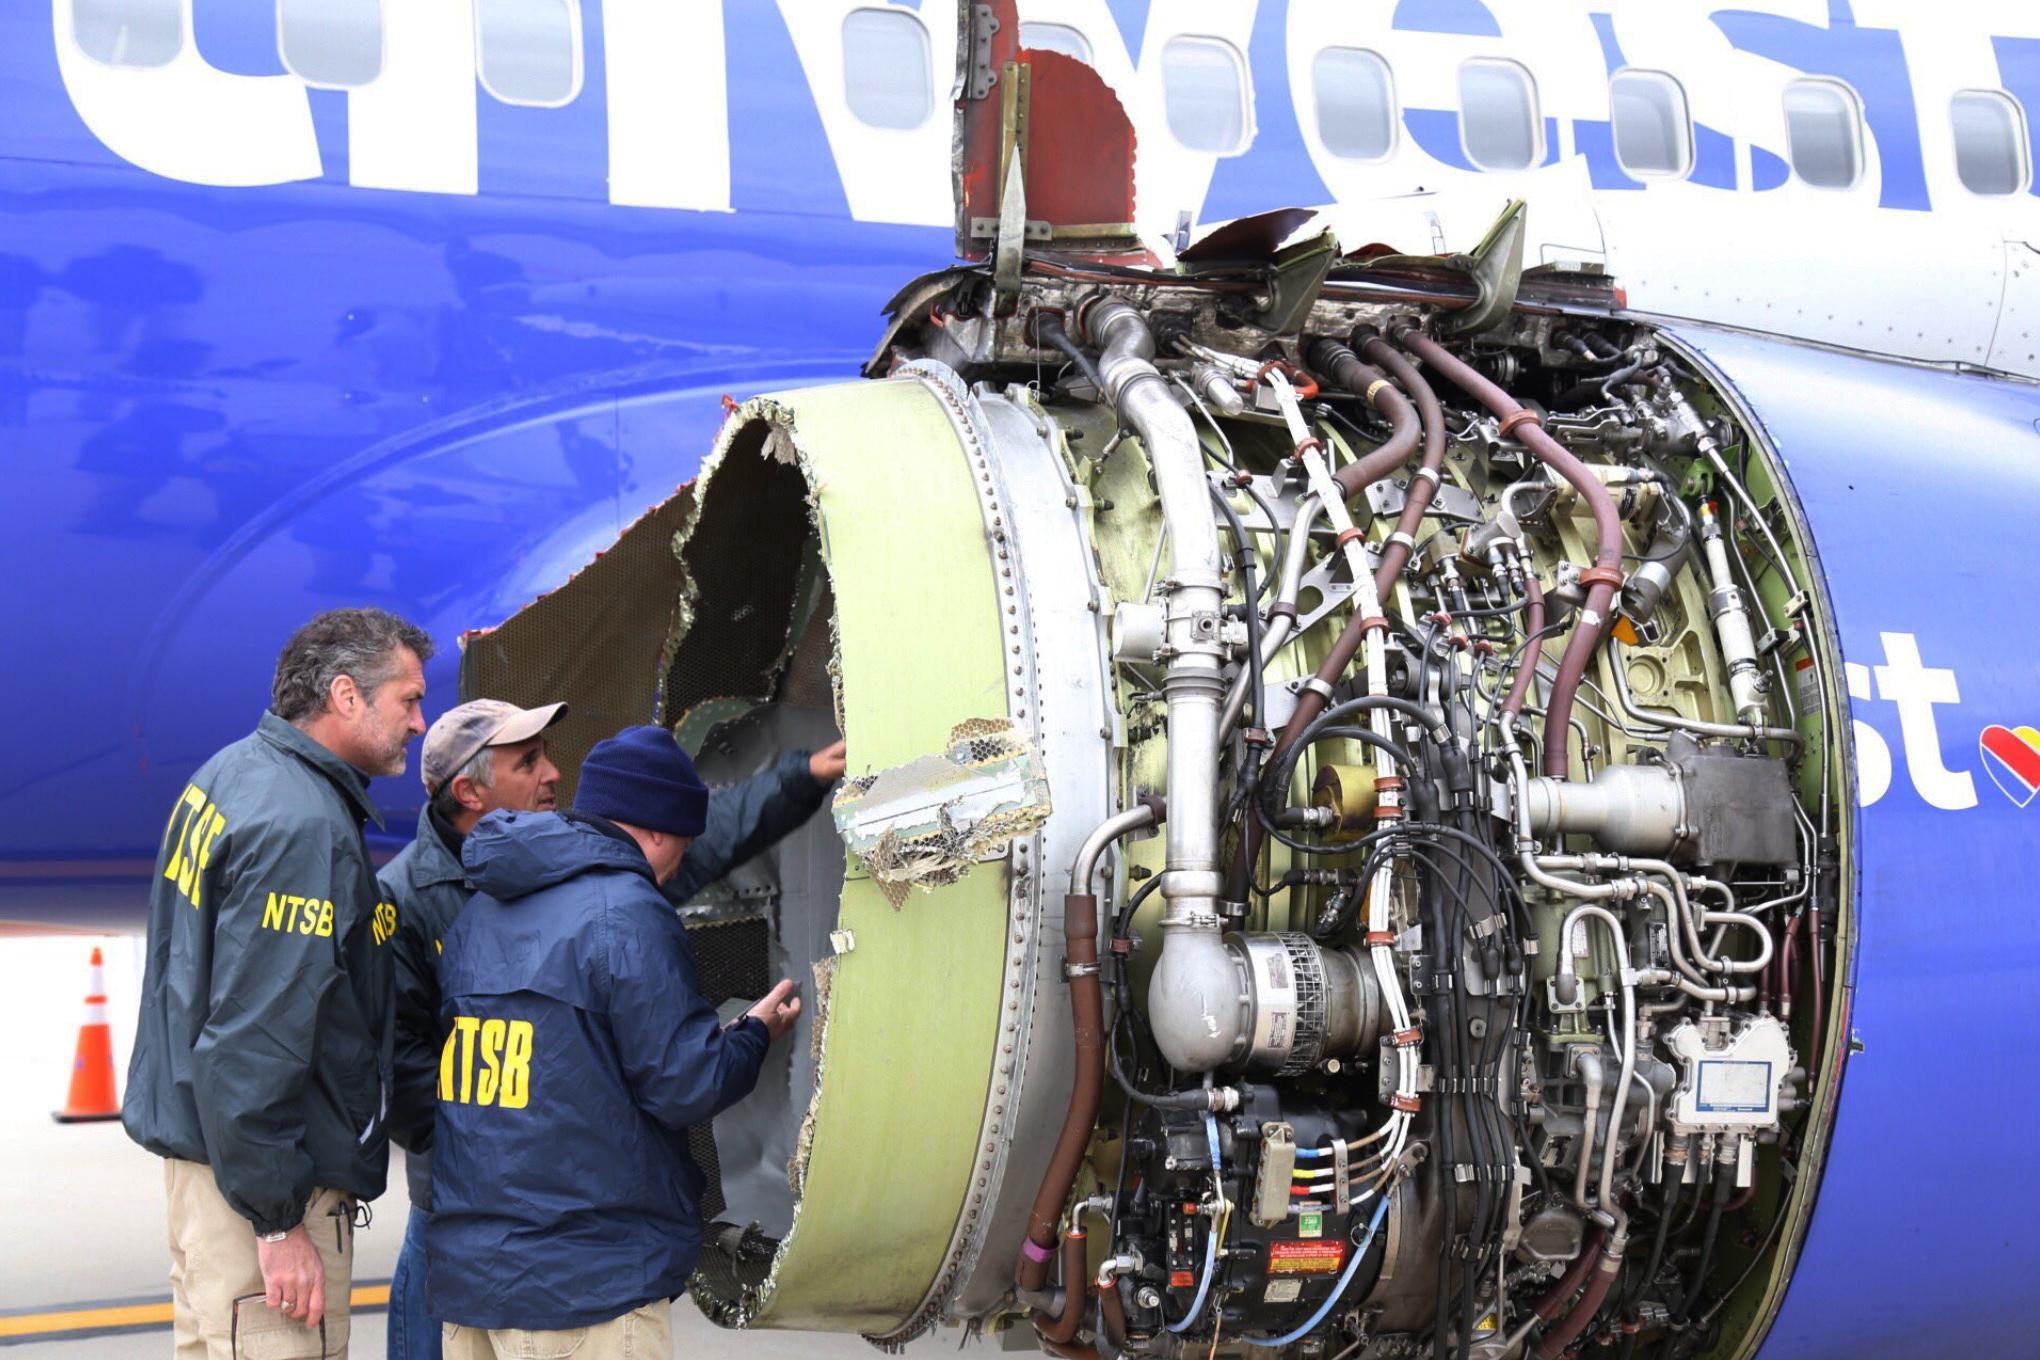 Southwest_Airlines_Emergency_Landing_95245-159532.jpg16542188